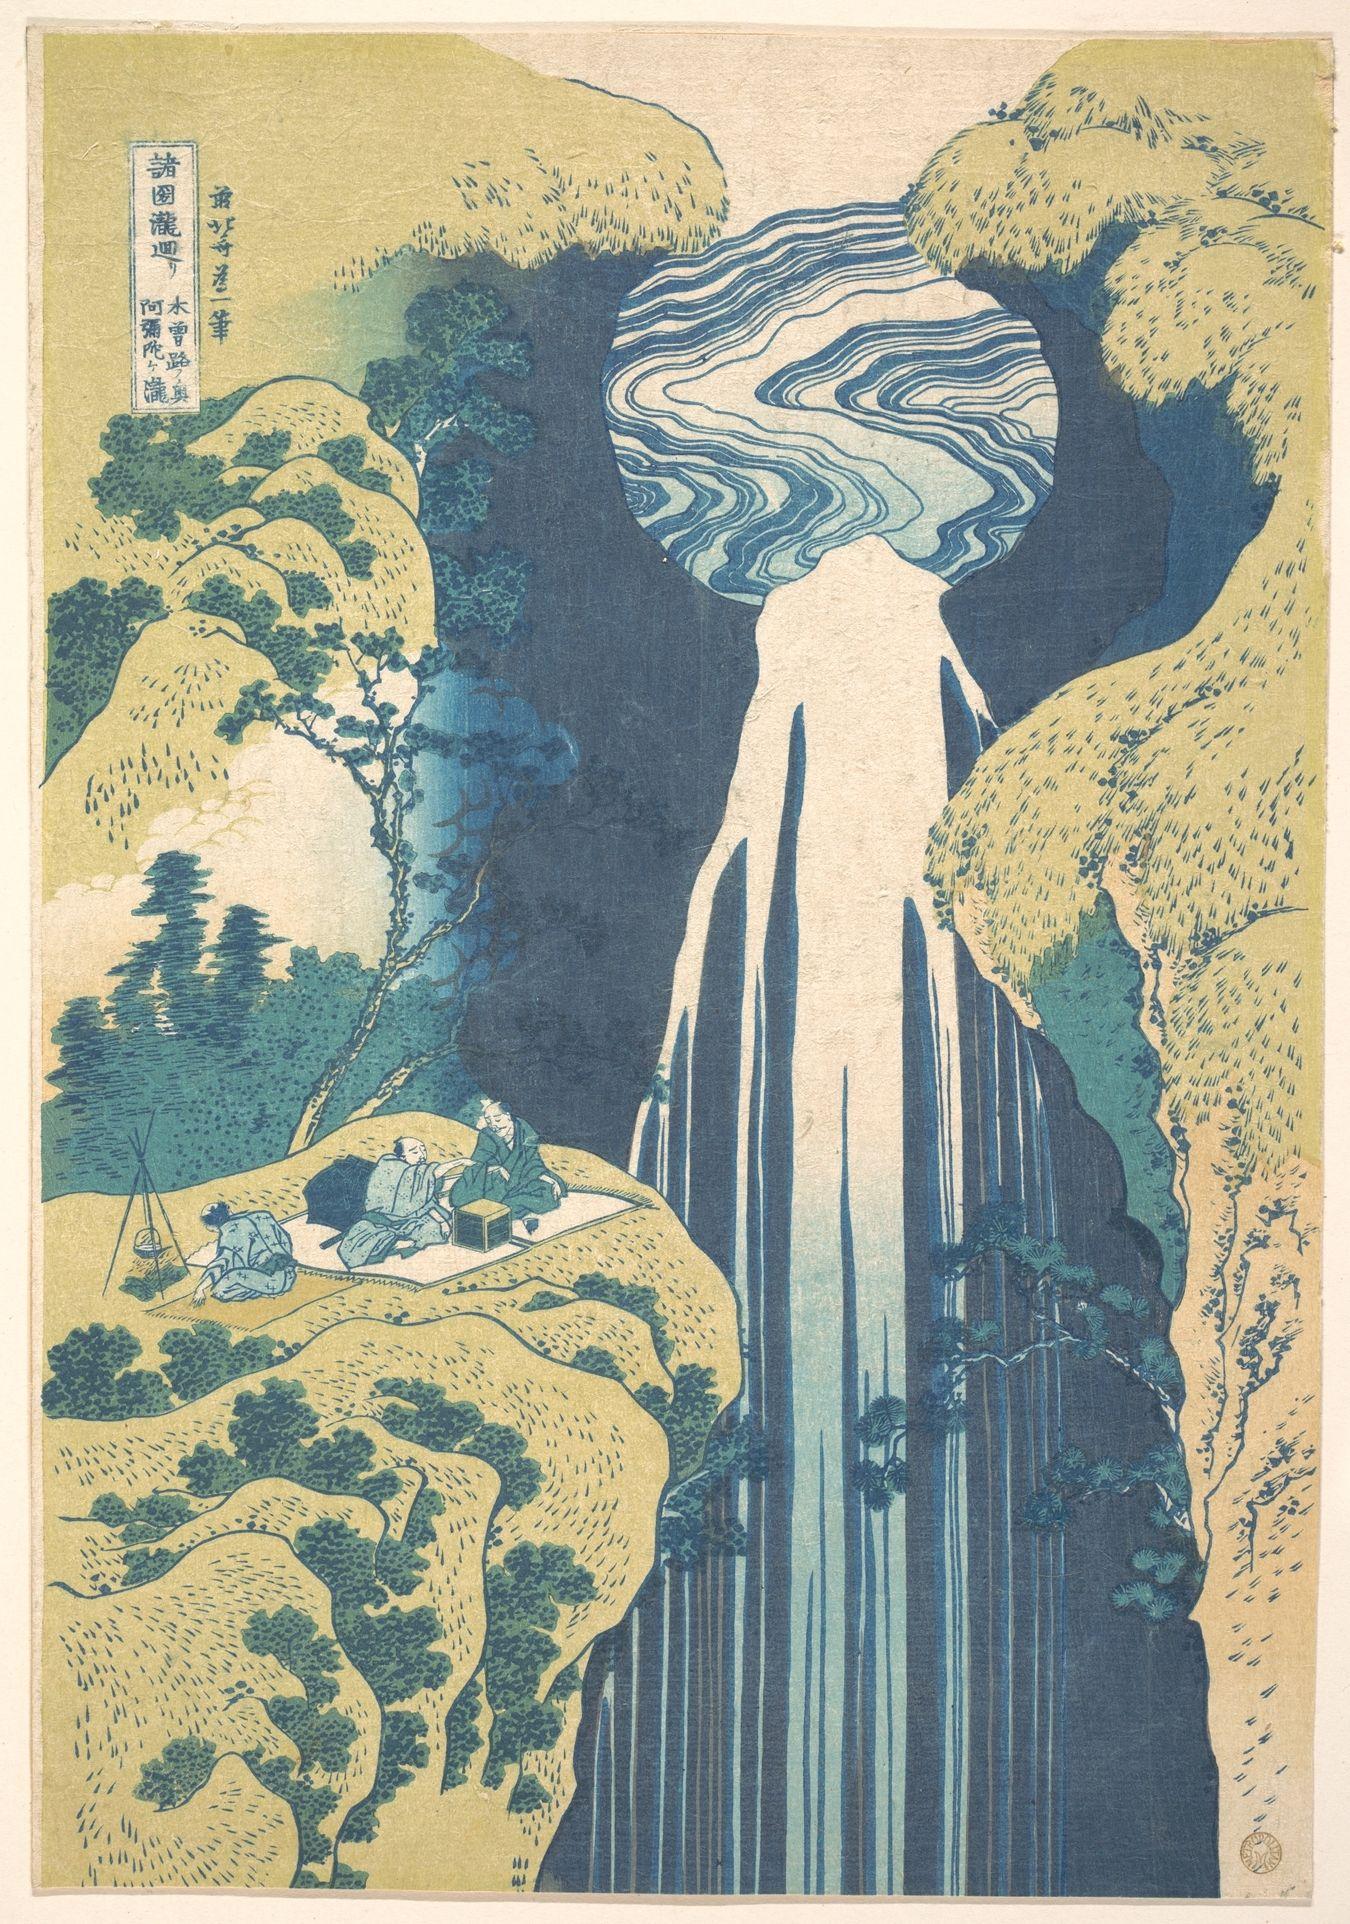 Hokusai, woodblock print